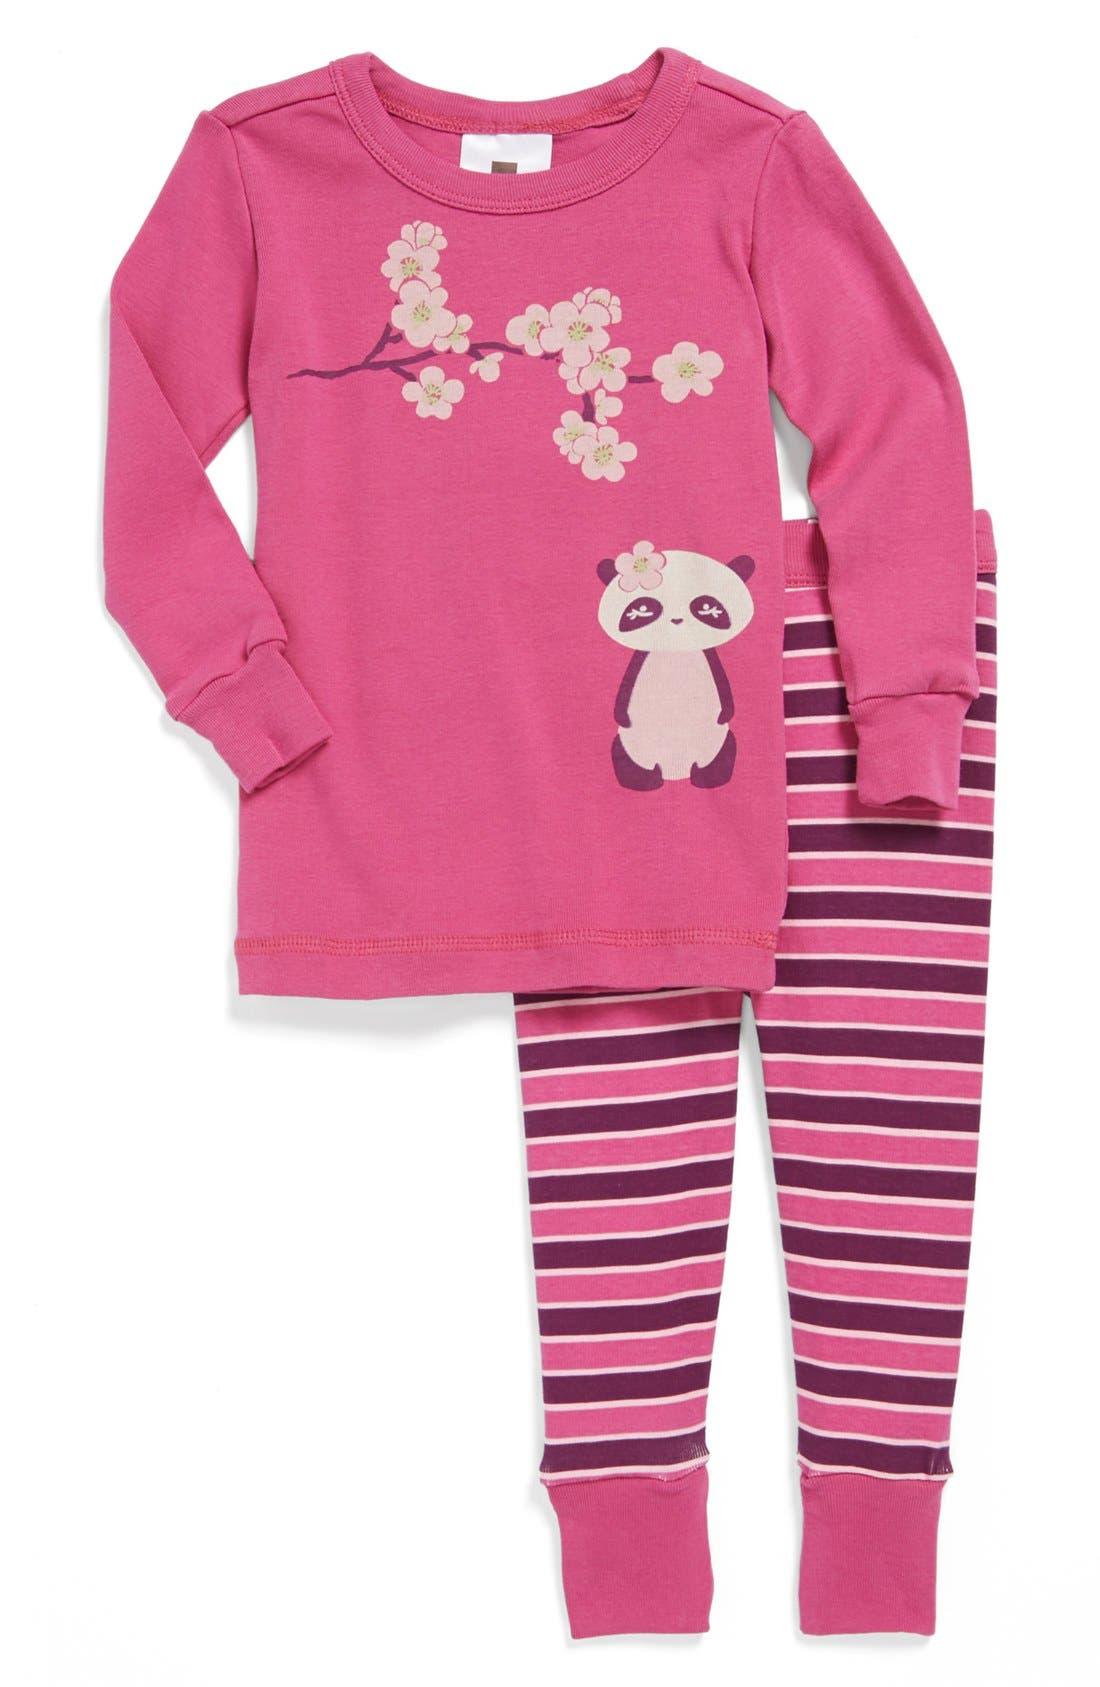 Main Image - Tea Collection 'Panda' Pajamas (Baby Girls)